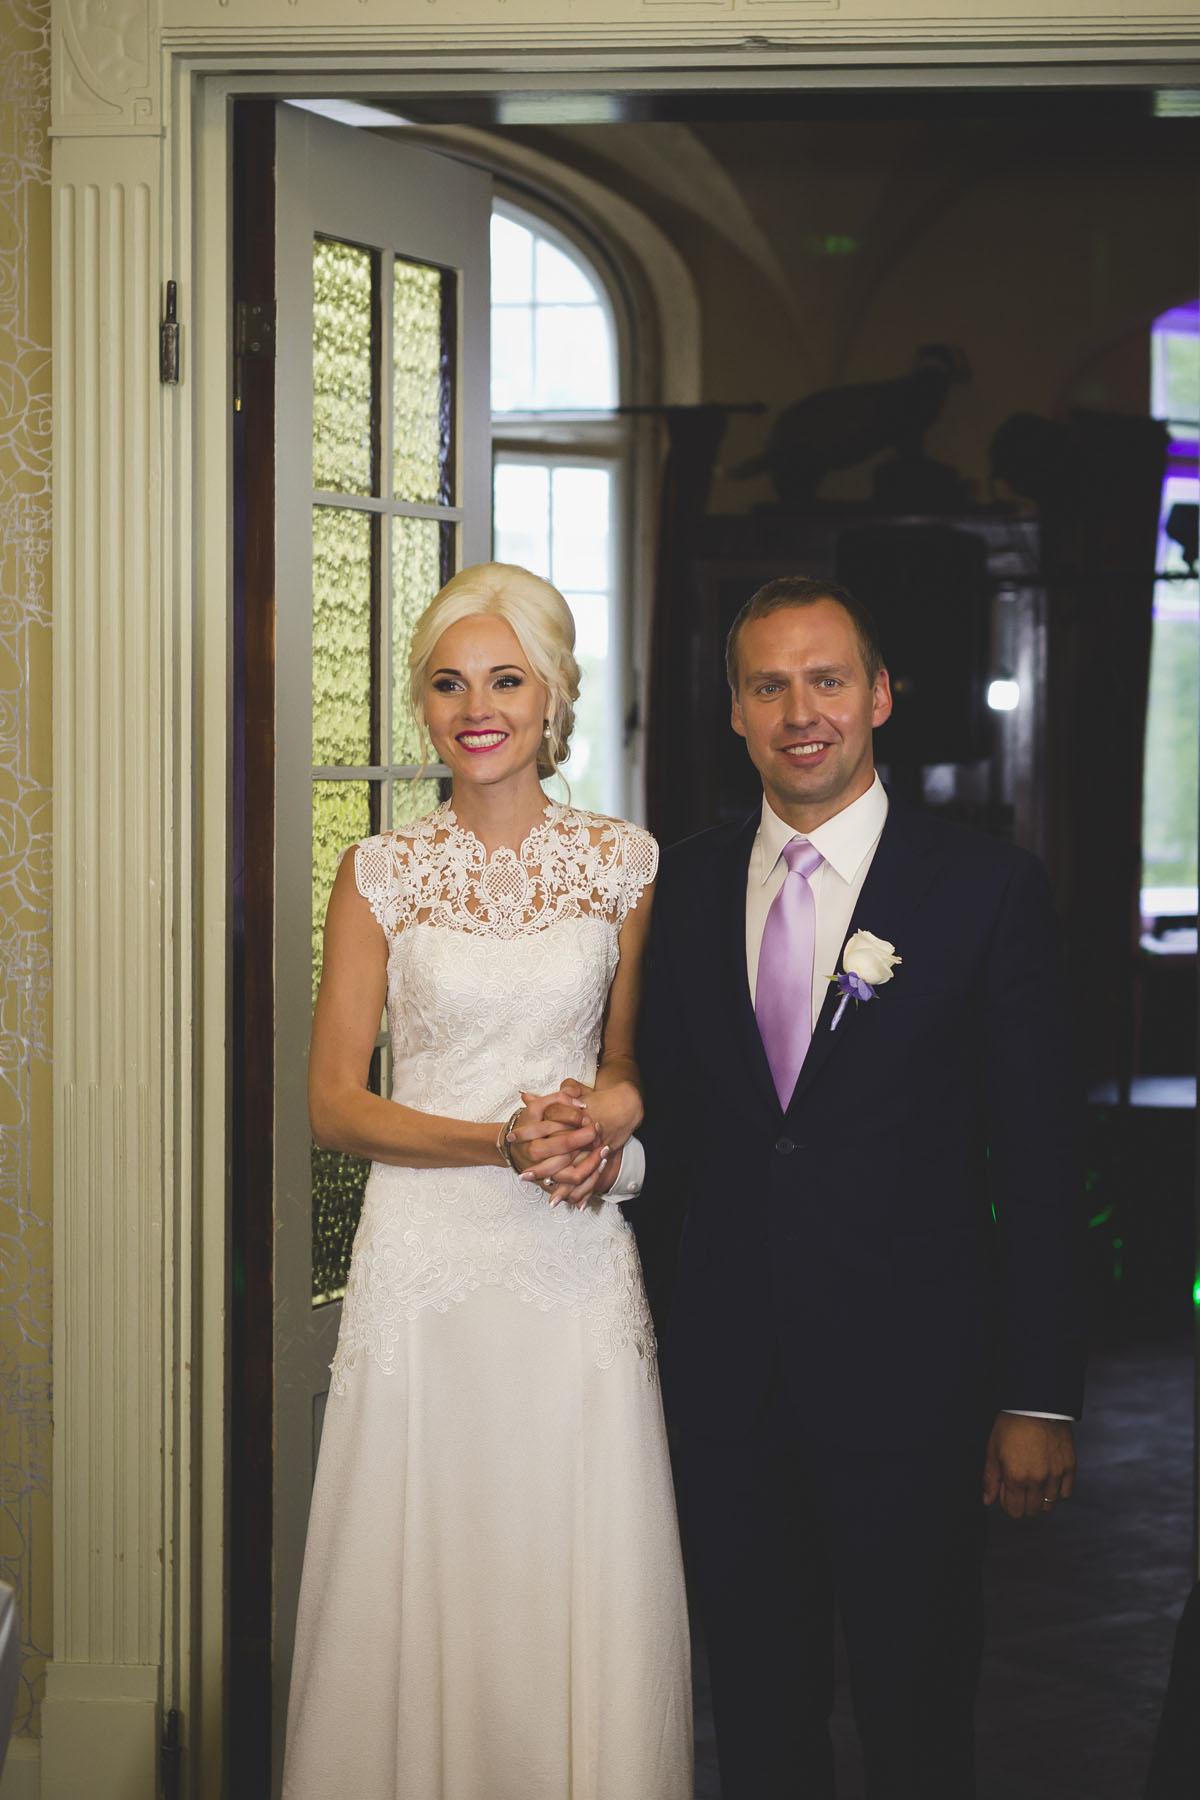 wedding-photos-105-estonia-wedding-photographer.jpg